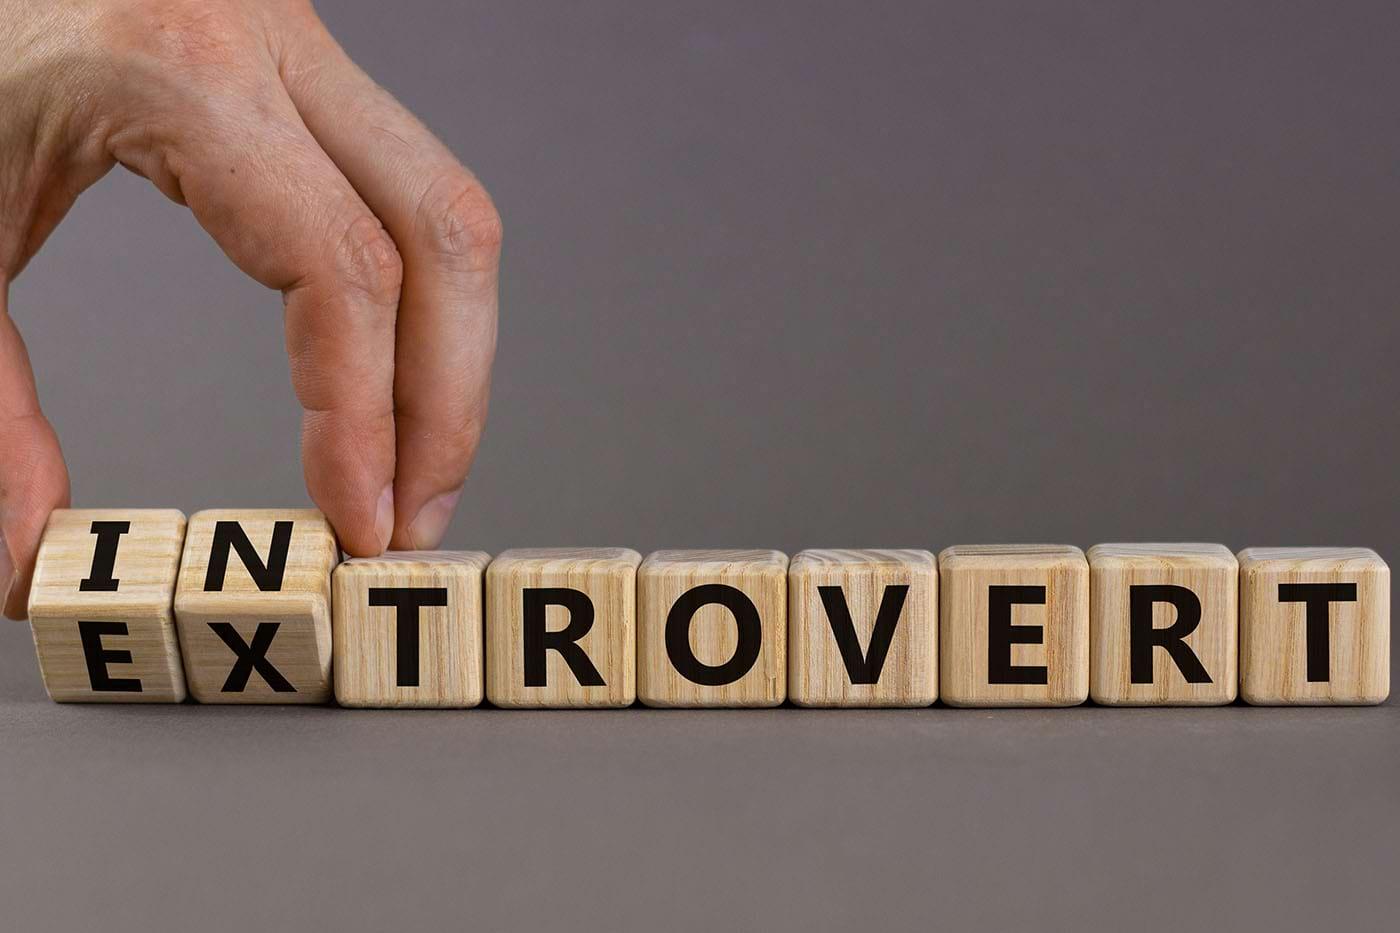 Ce probleme de memorie pot avea persoanele introvertite?